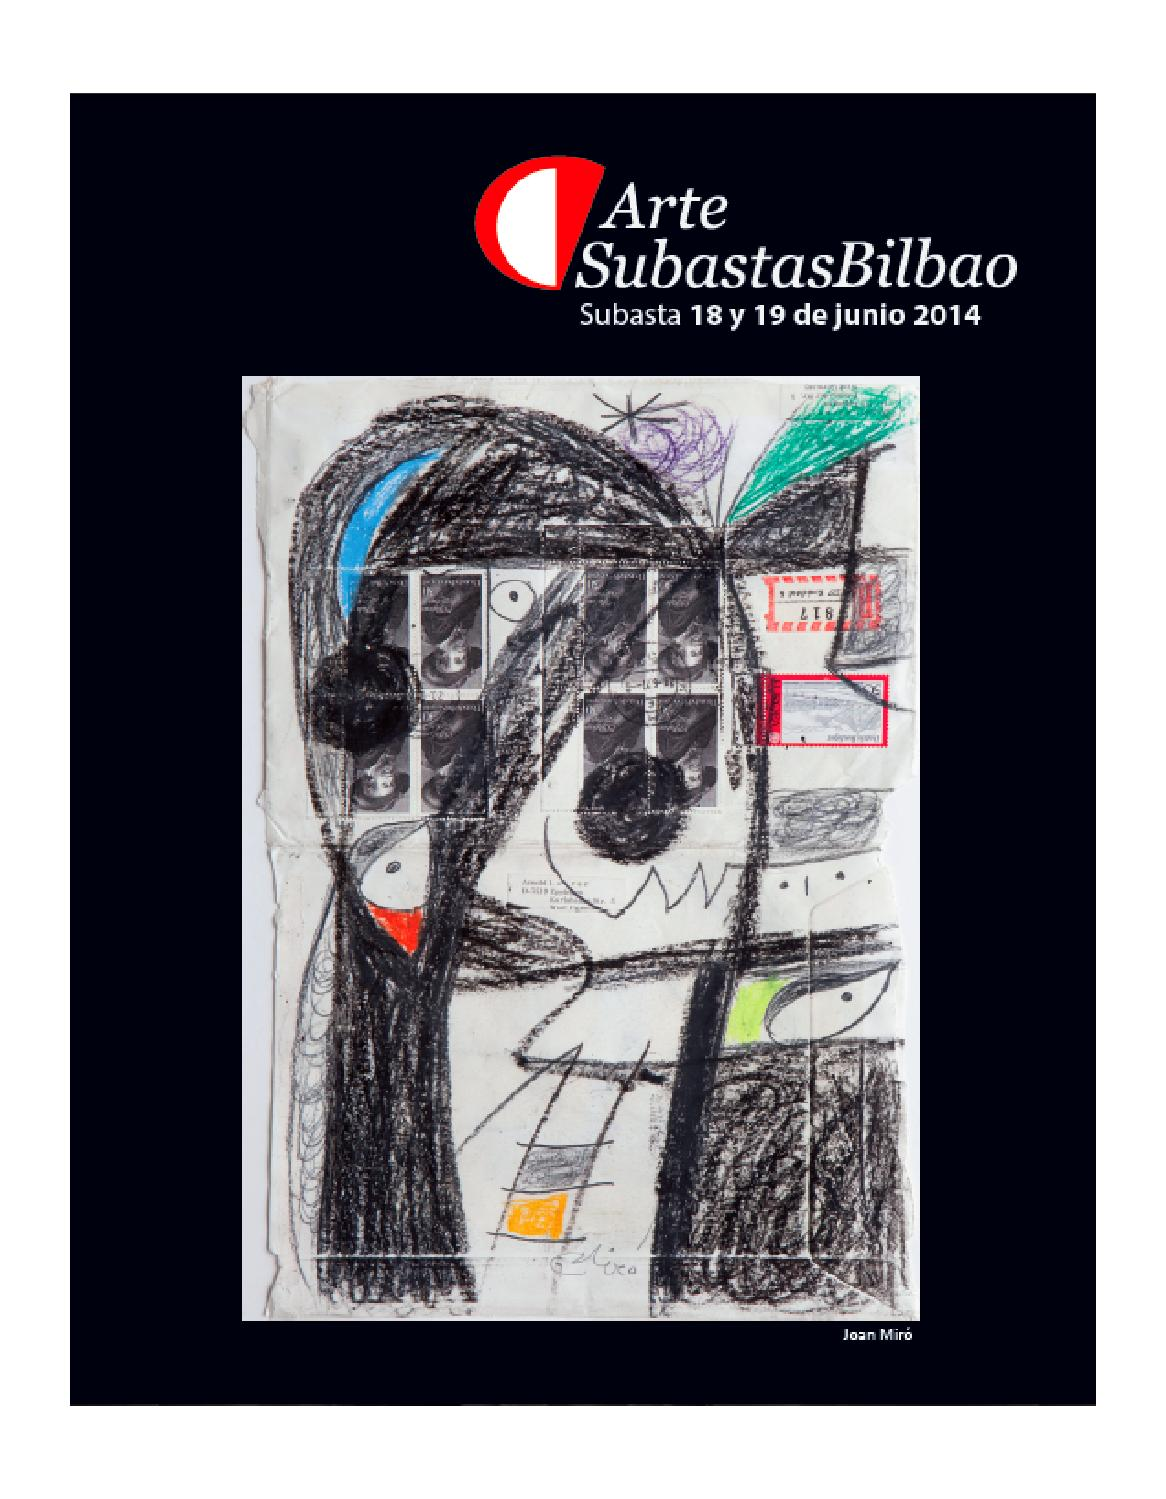 Arte Subastas Bilbao by Arte Subastas Bilbao - issuu